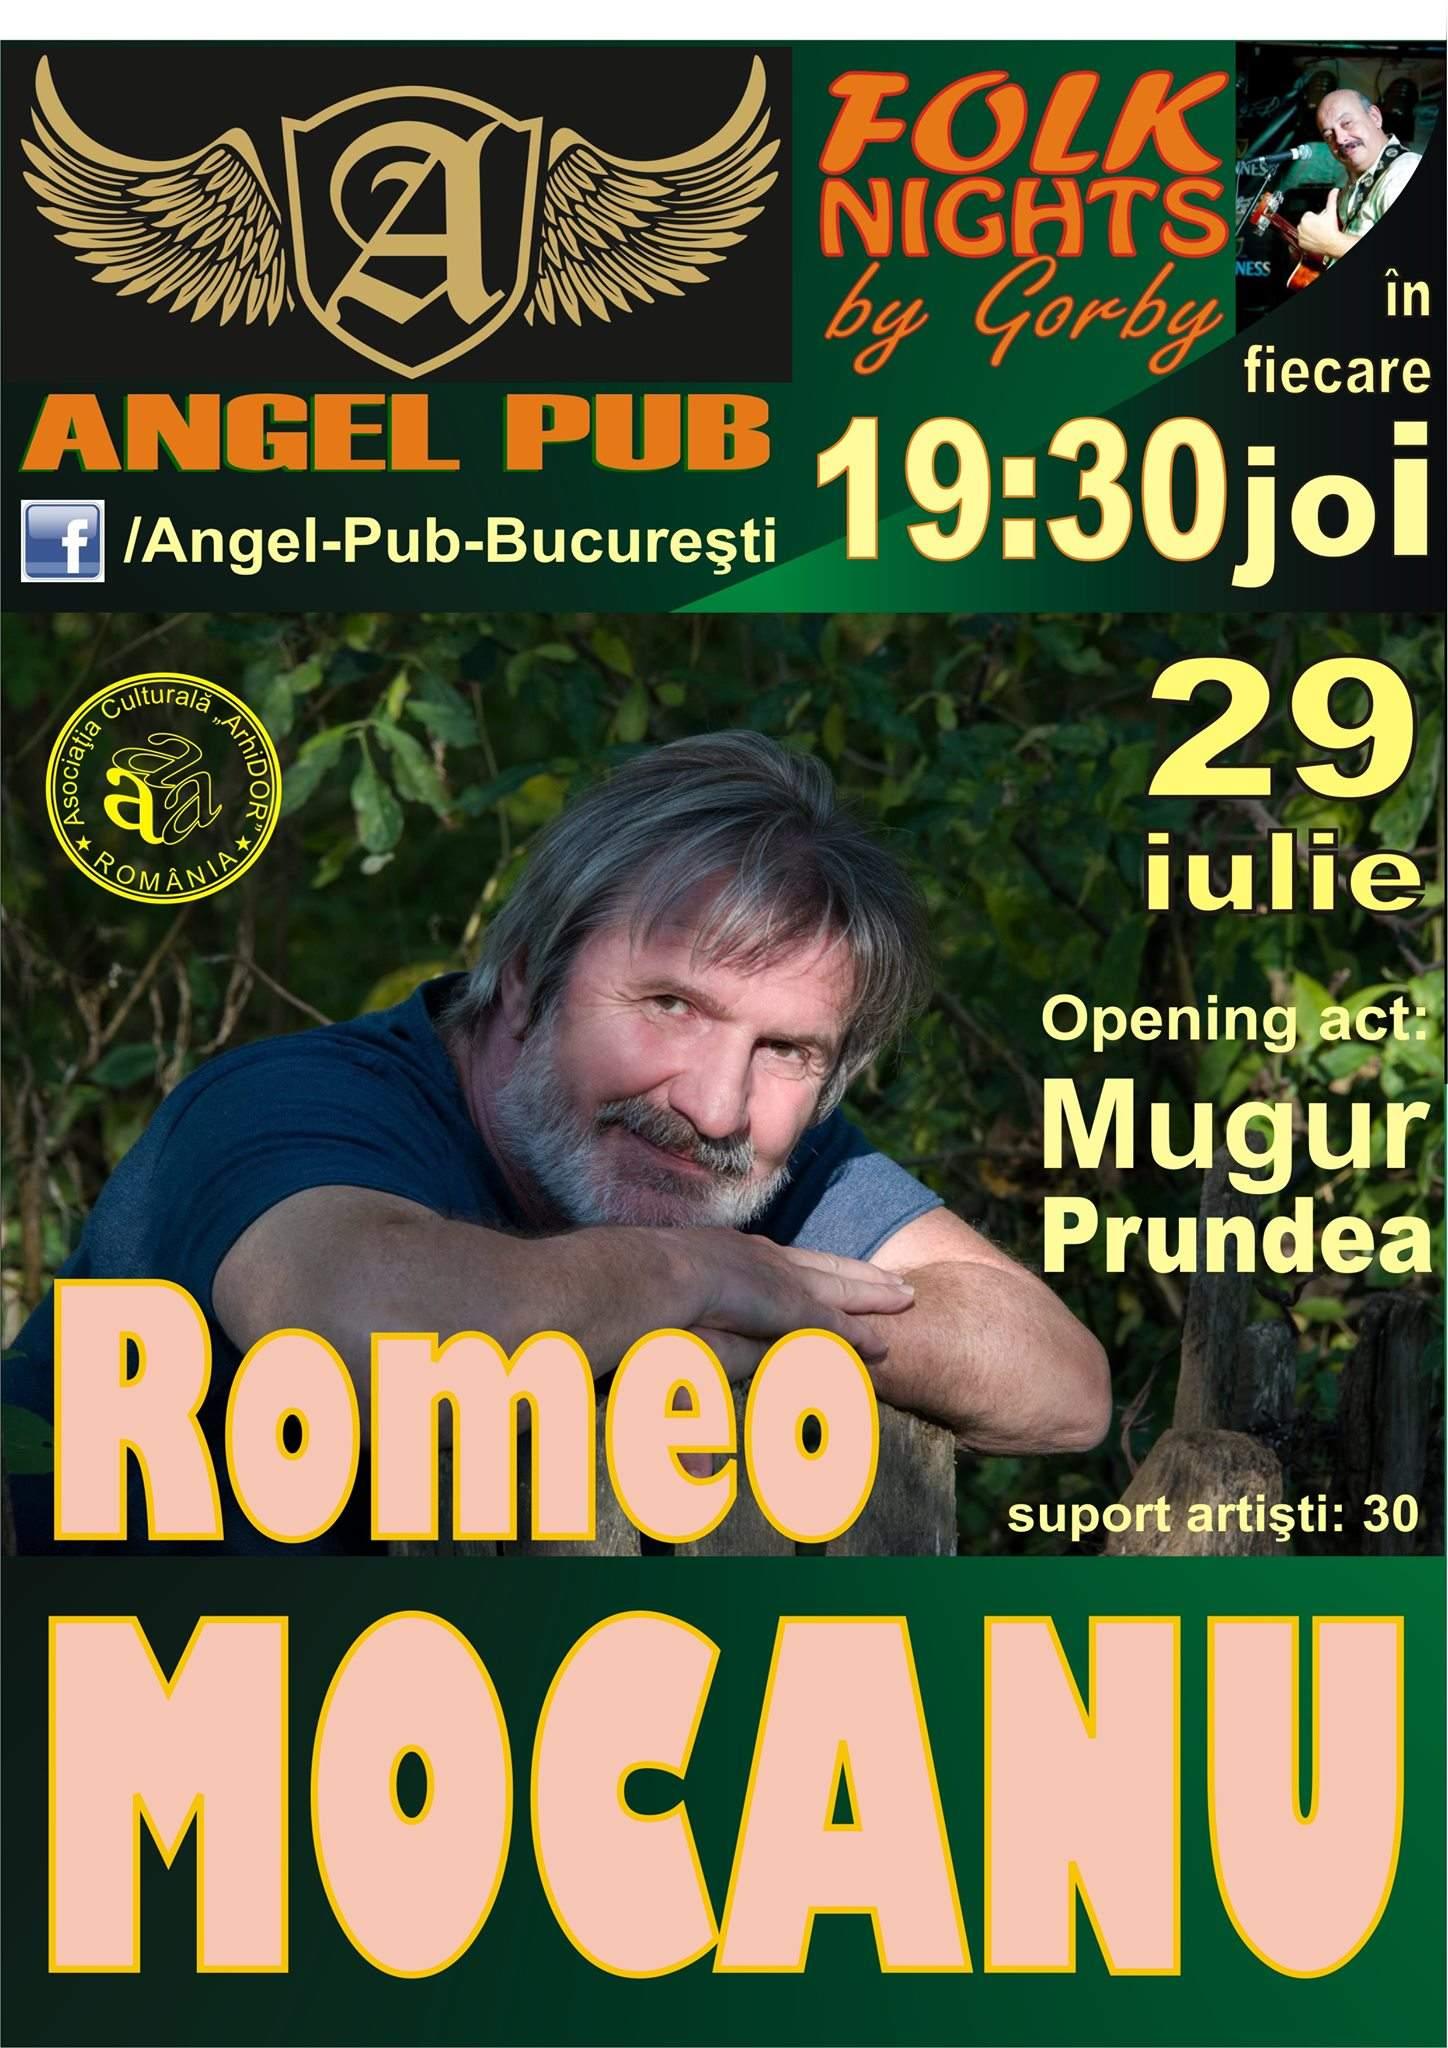 Romeo Mocanu @ Folk Nights by Gorby